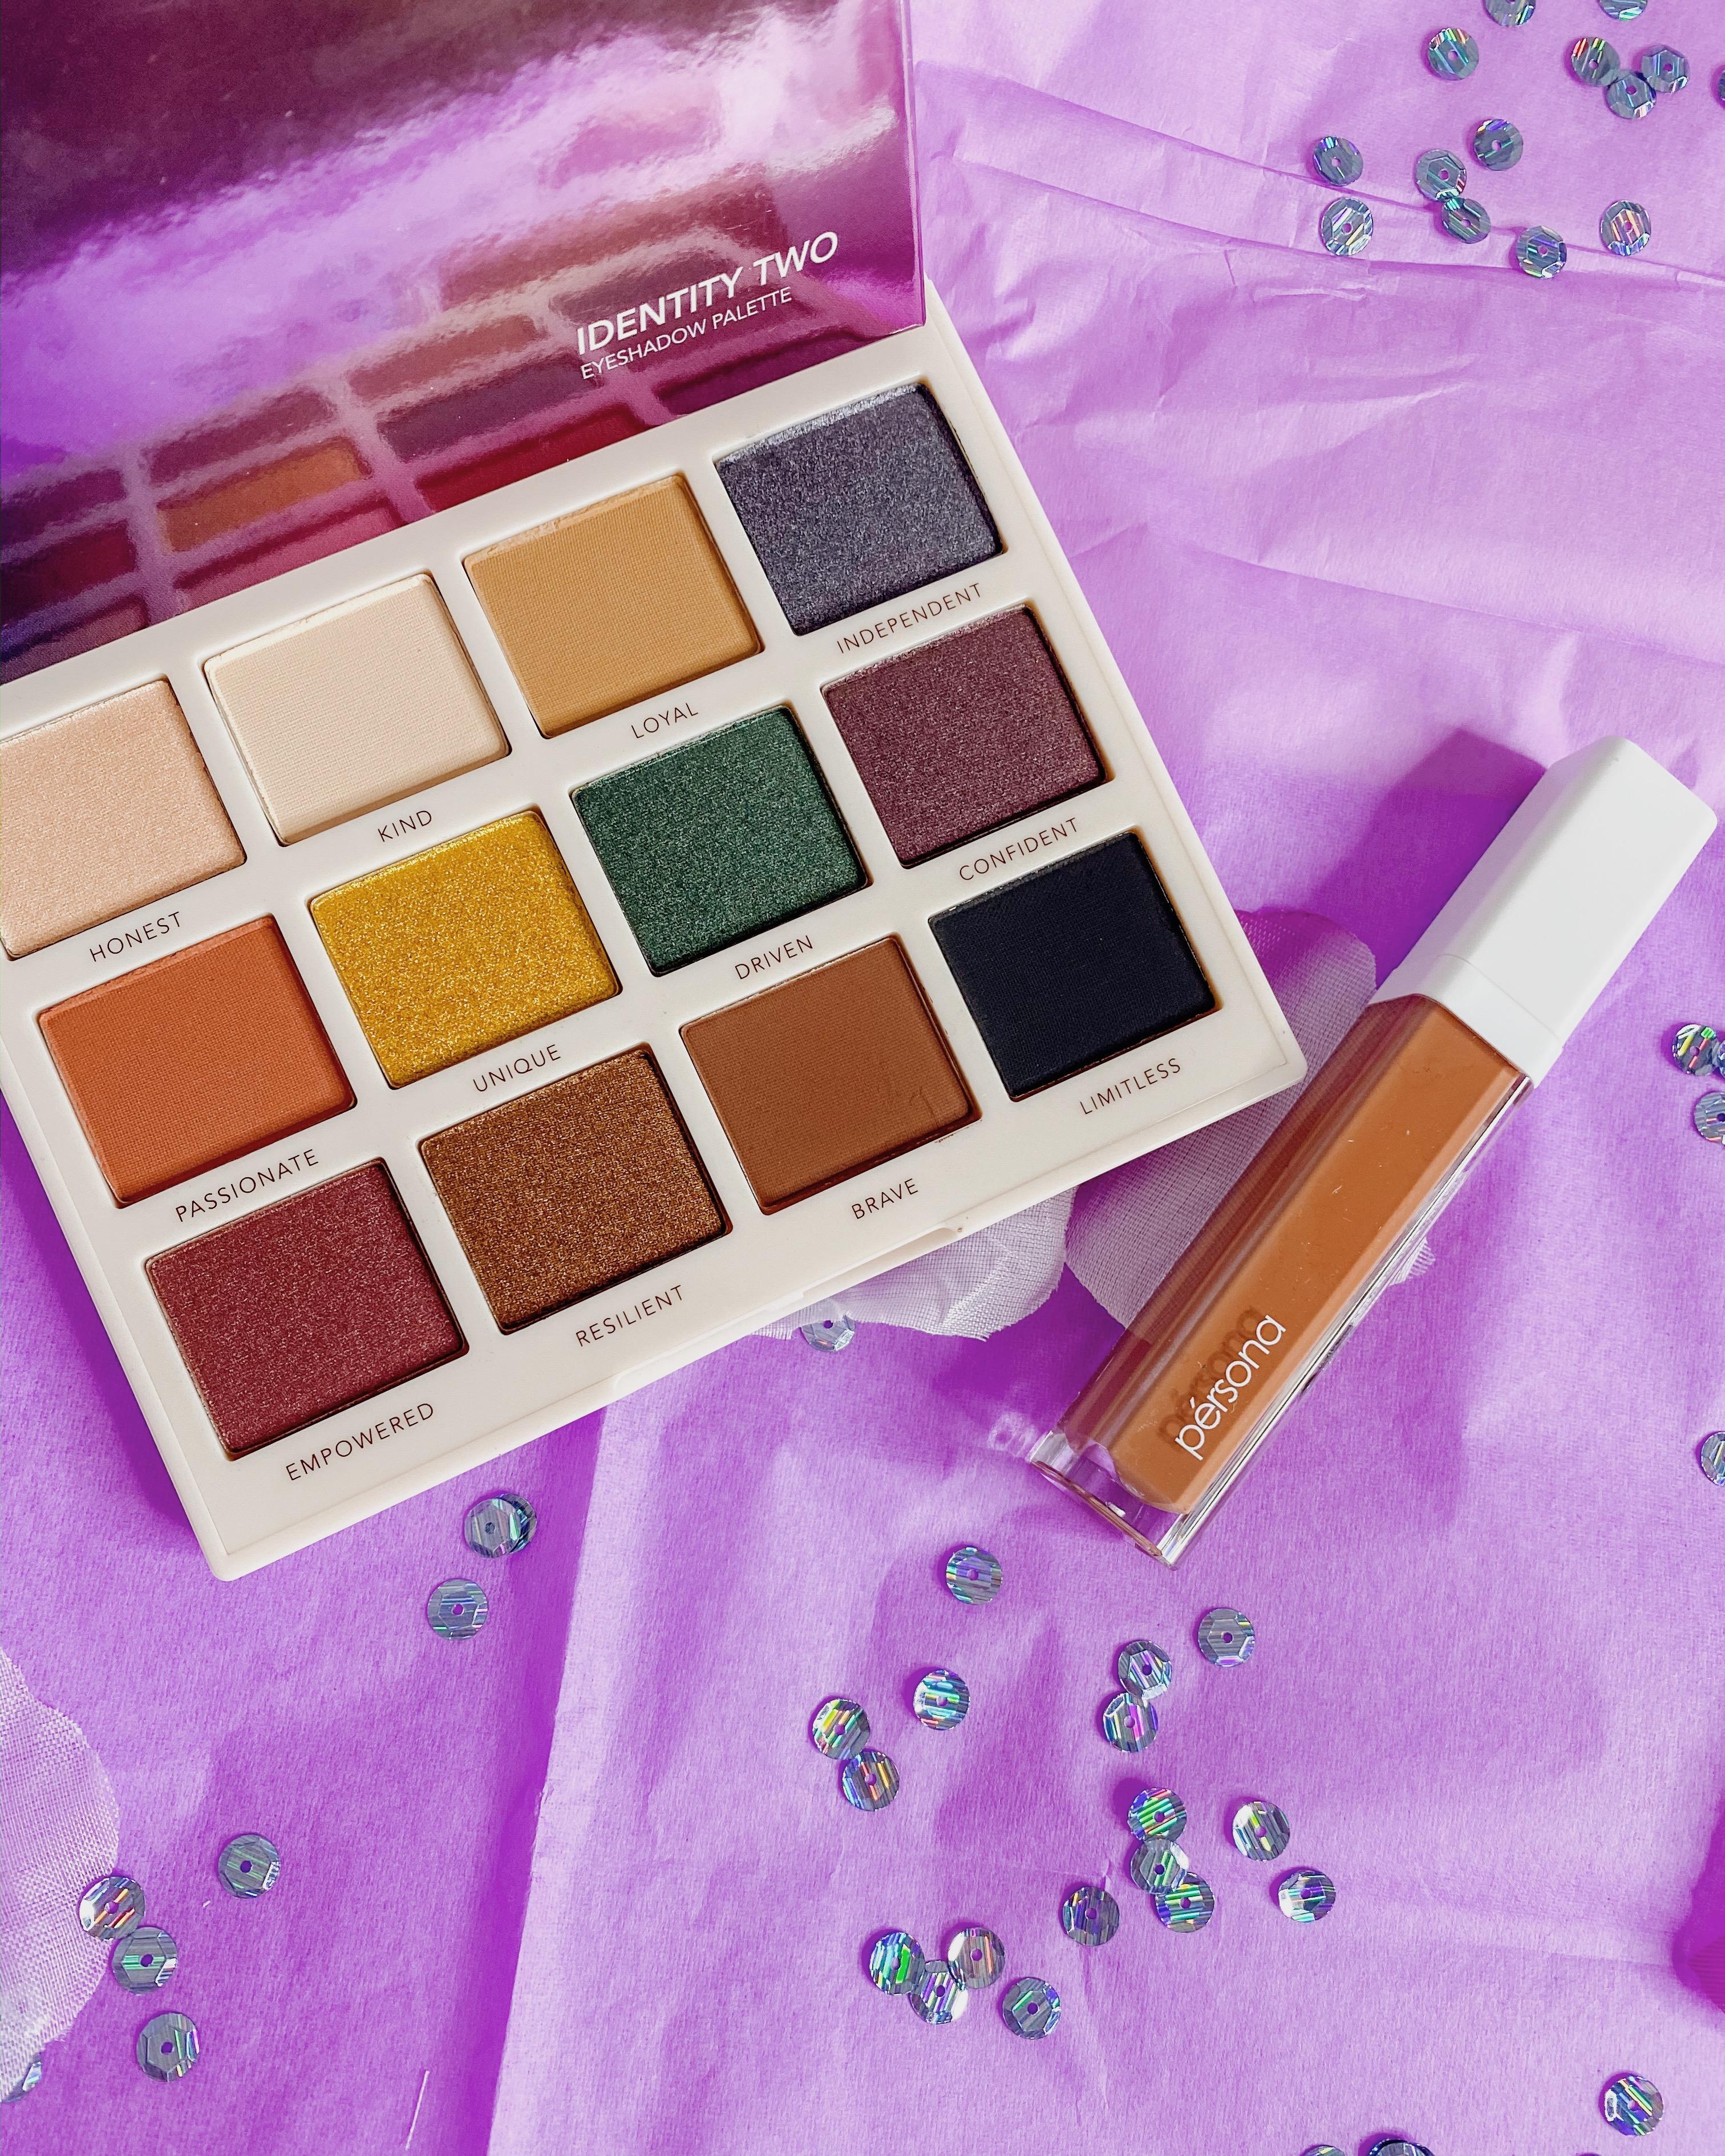 2020 Beauty Low Buy Update #1 | Persona Cosmetics Identity 2 Palette | Persona Cosmetics Season One Liquid Lipstick in OG